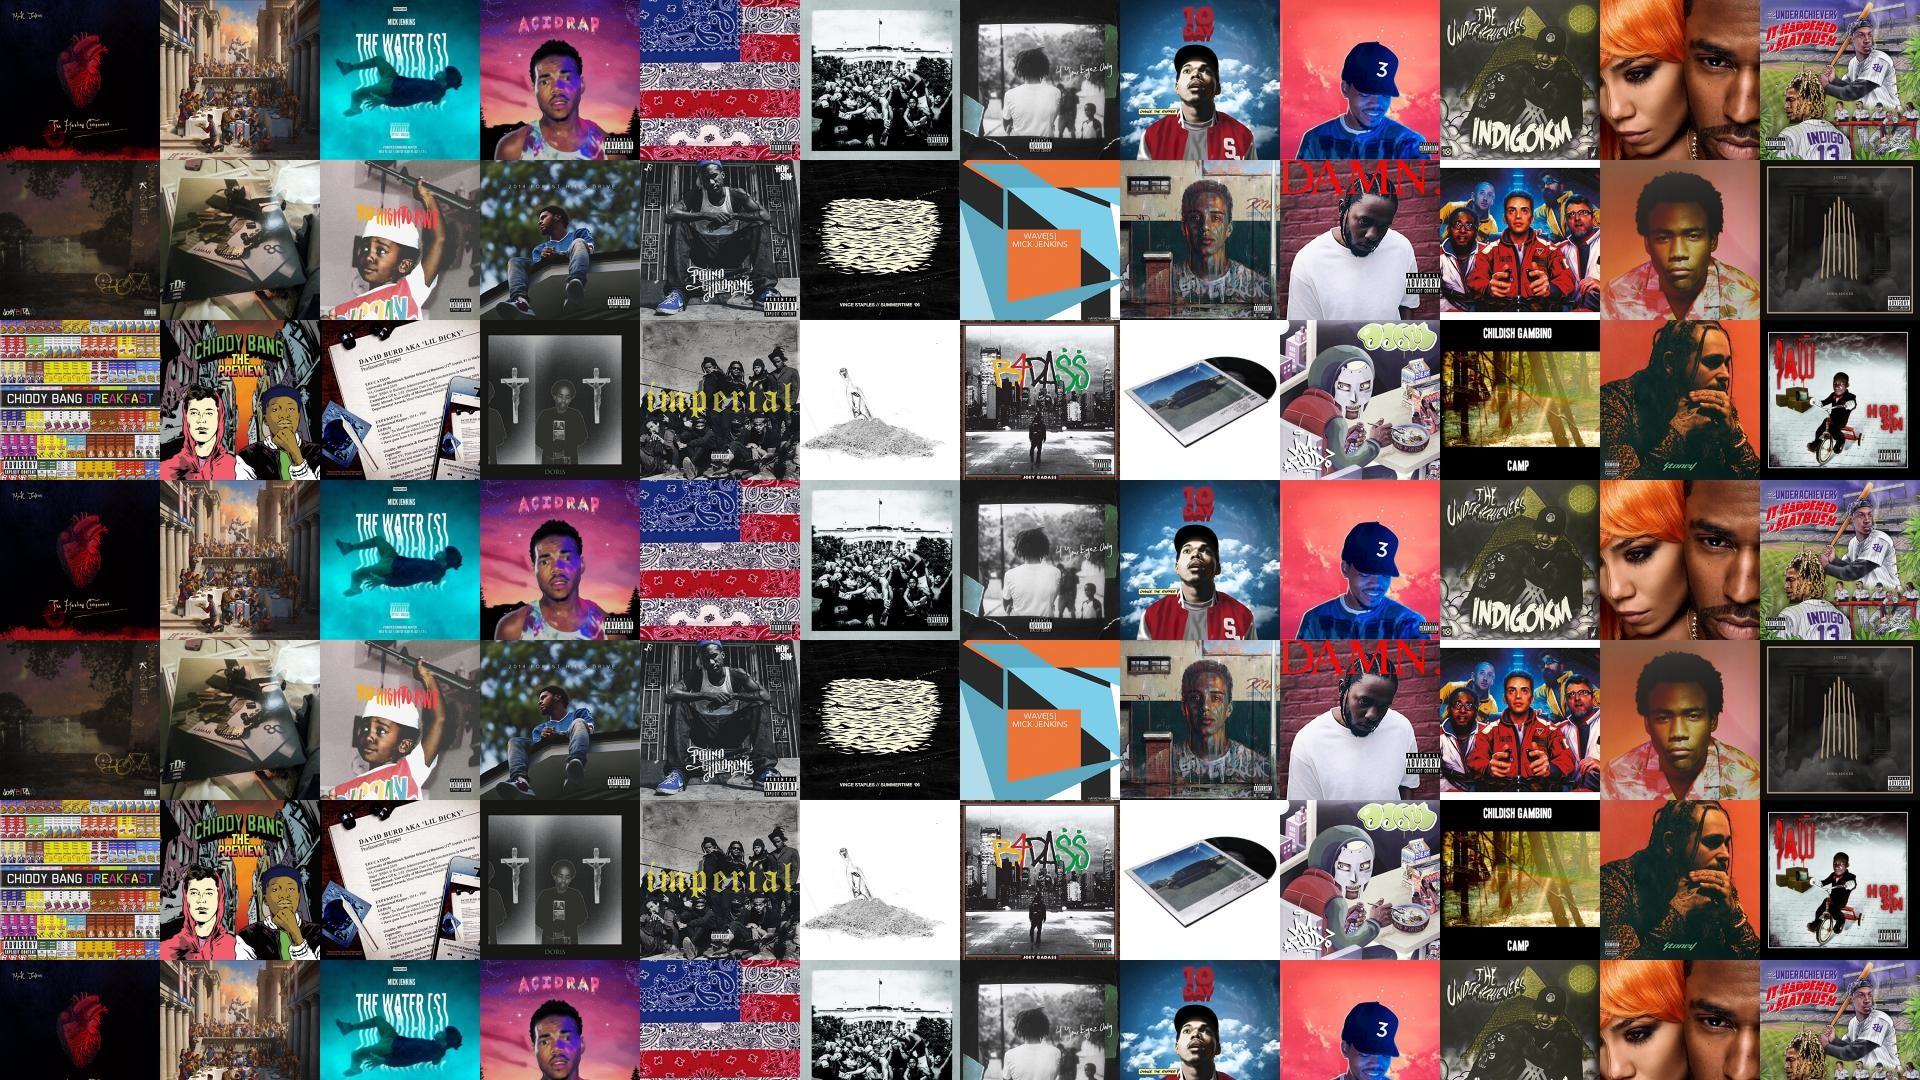 Mick Jenkins Logic Water Chance Rapper Wallpaper Â« Tiled Desktop Wallpaper